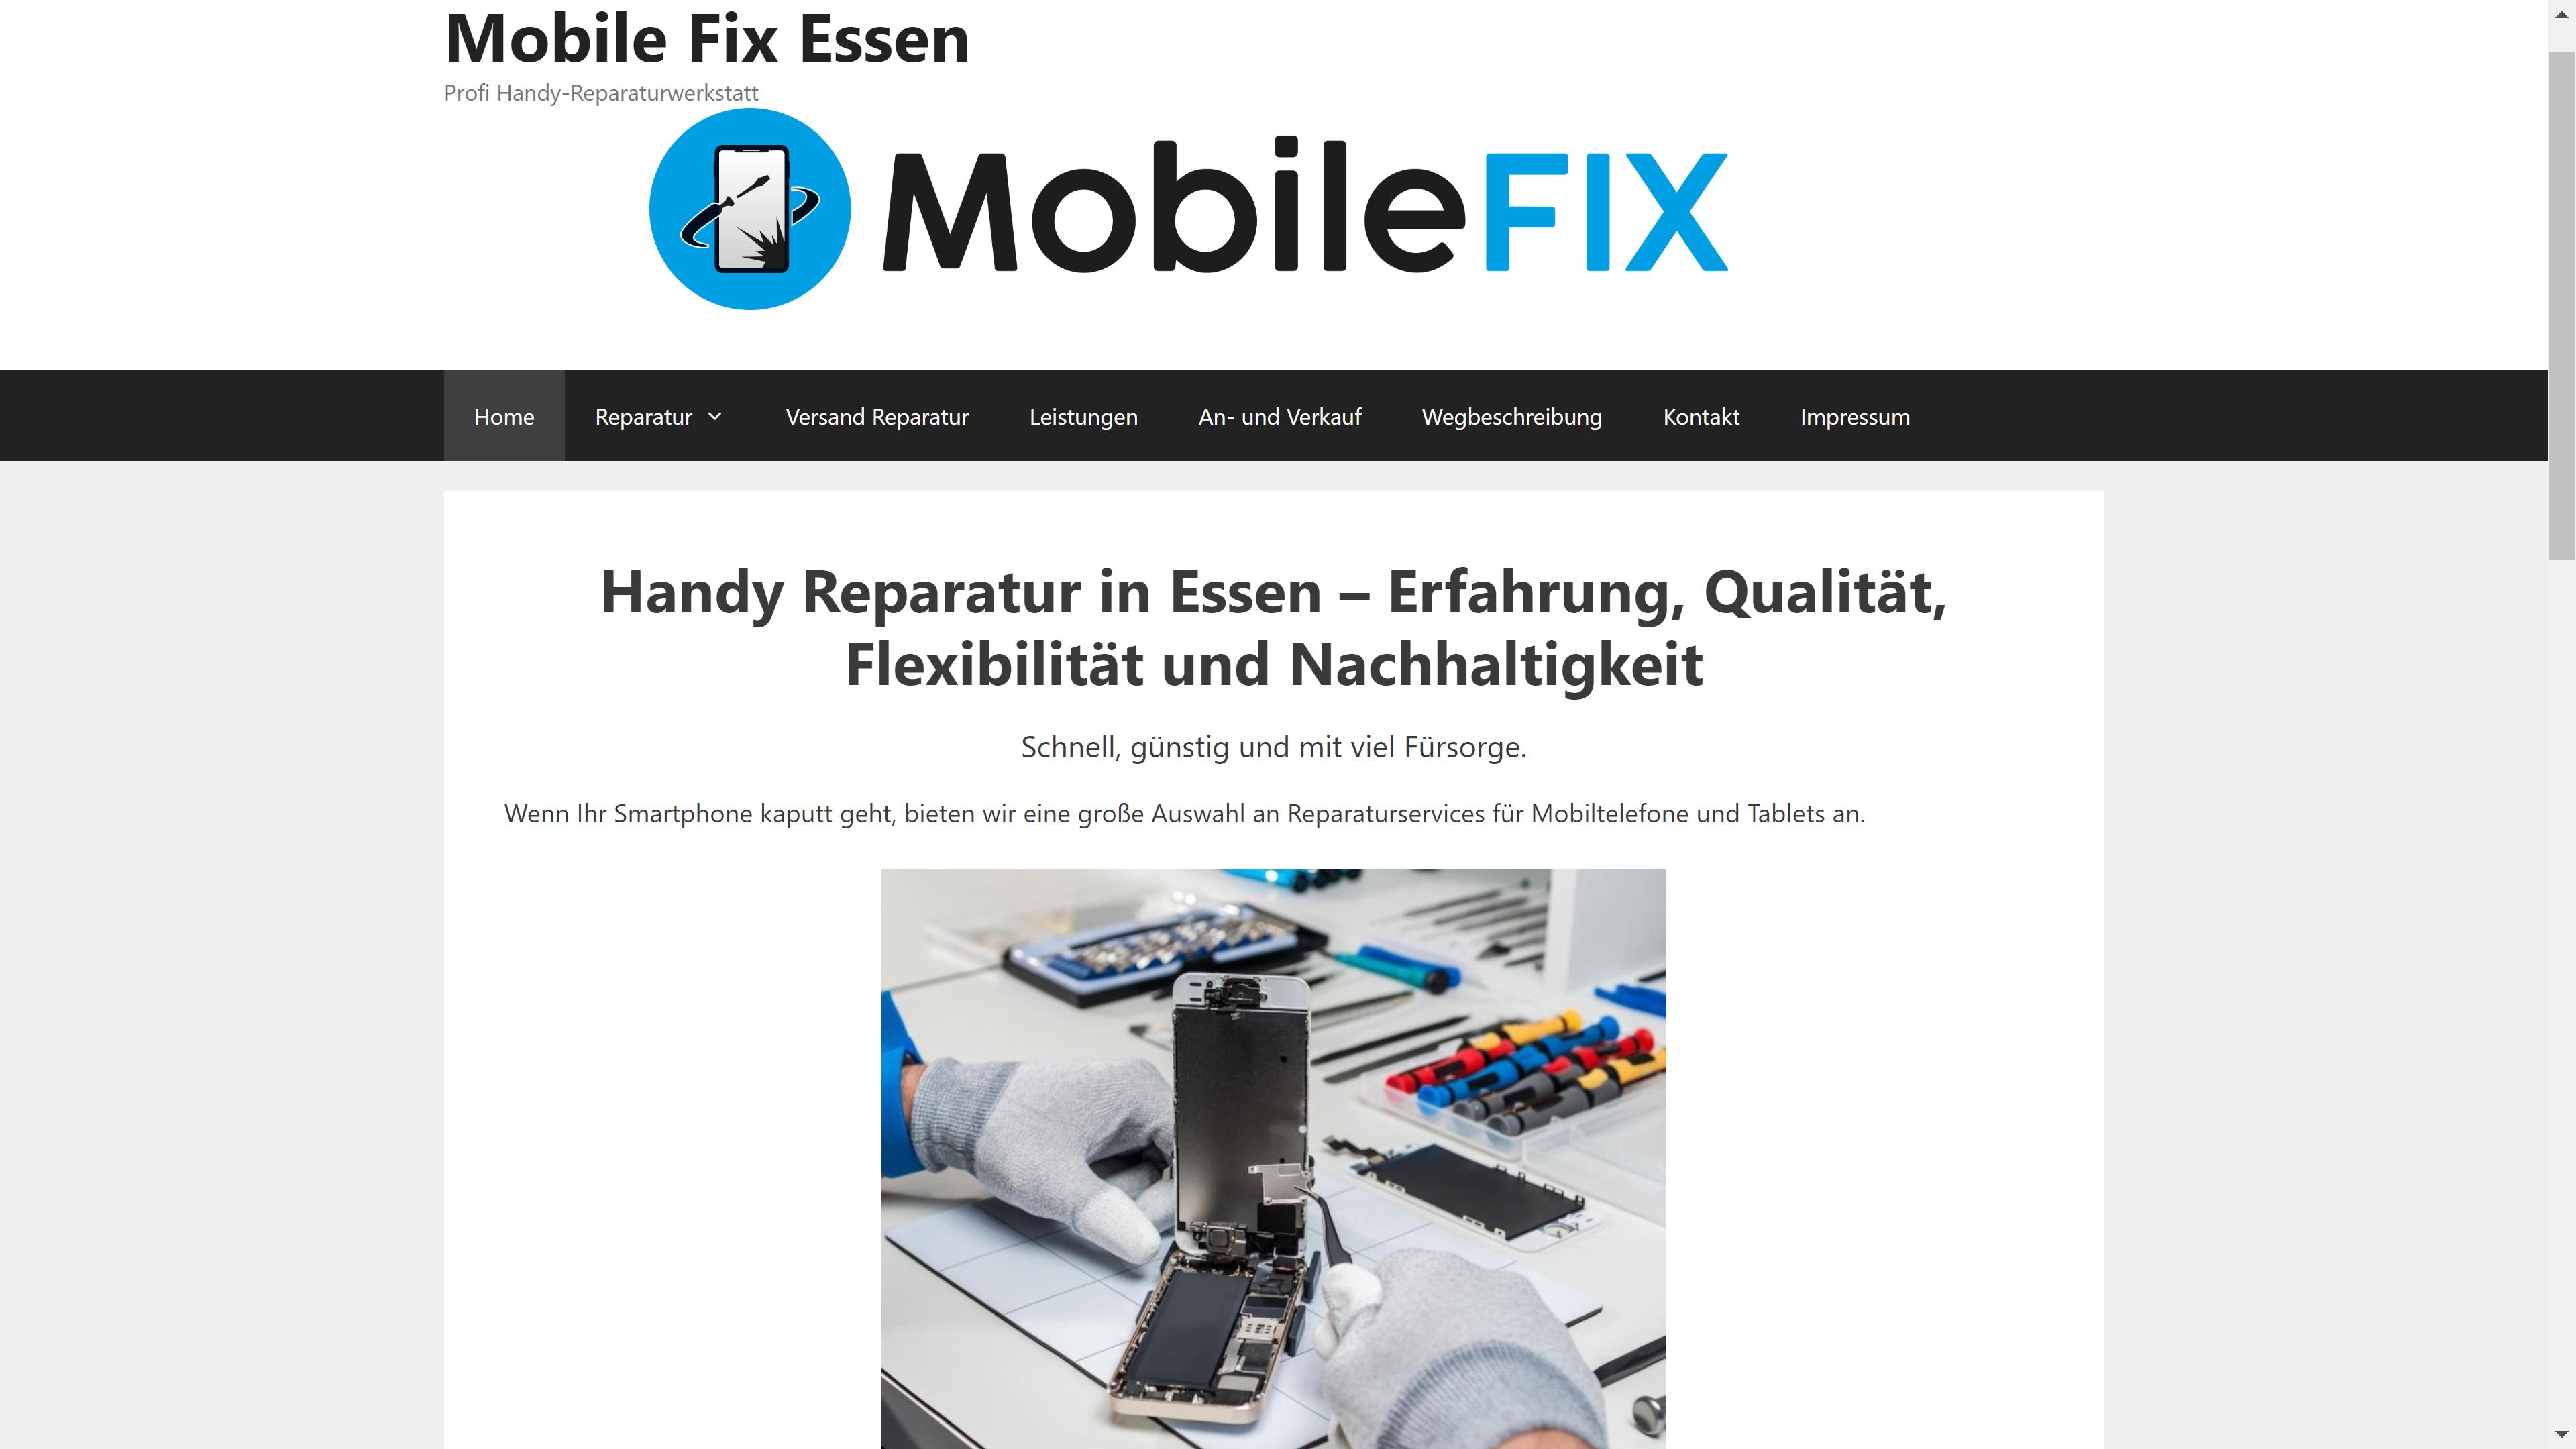 mobilefix-essen